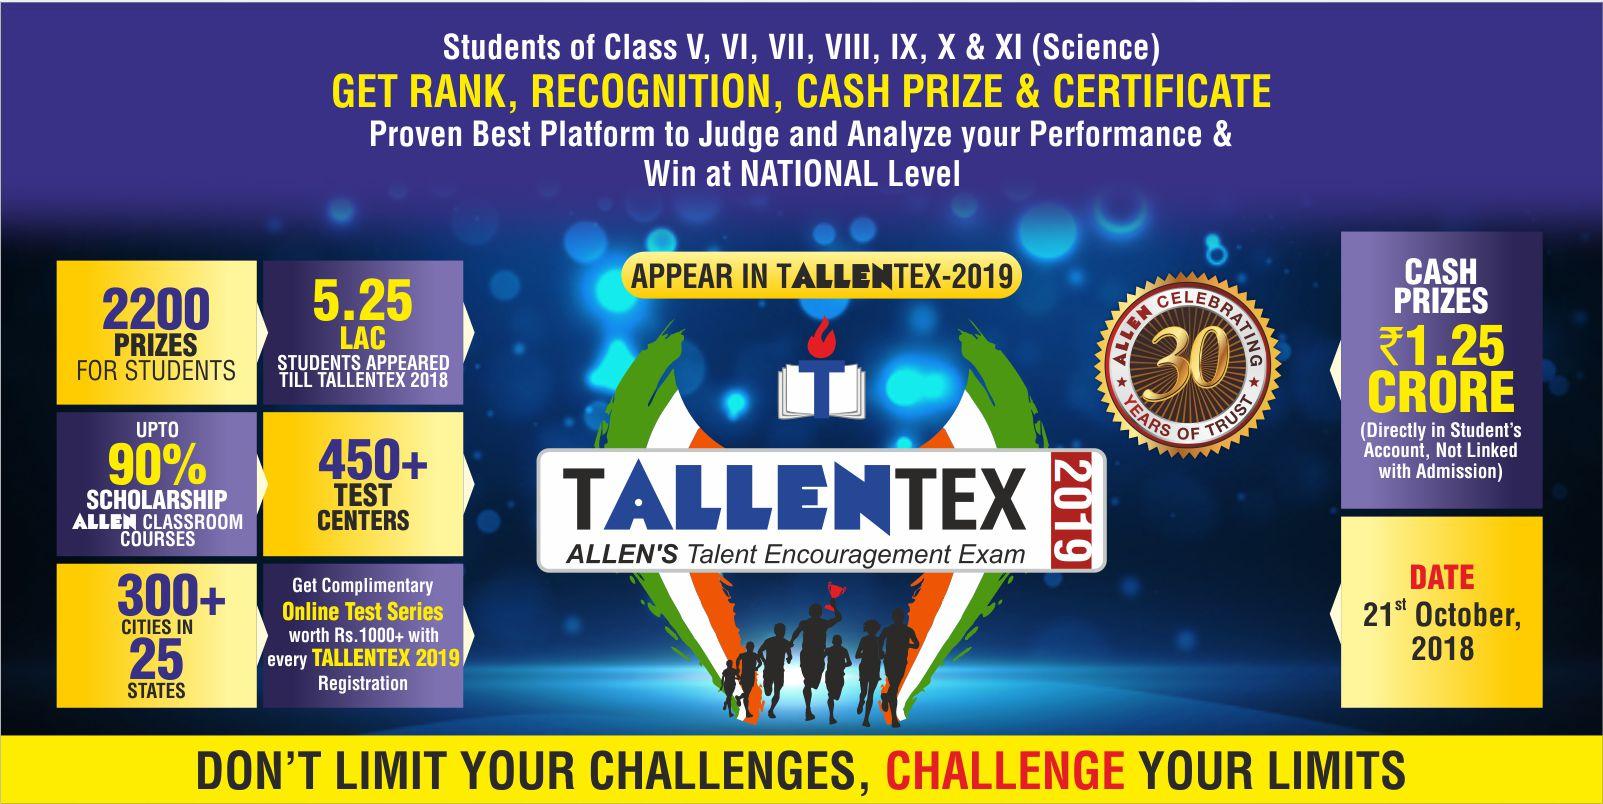 TALLENTEX - 2019